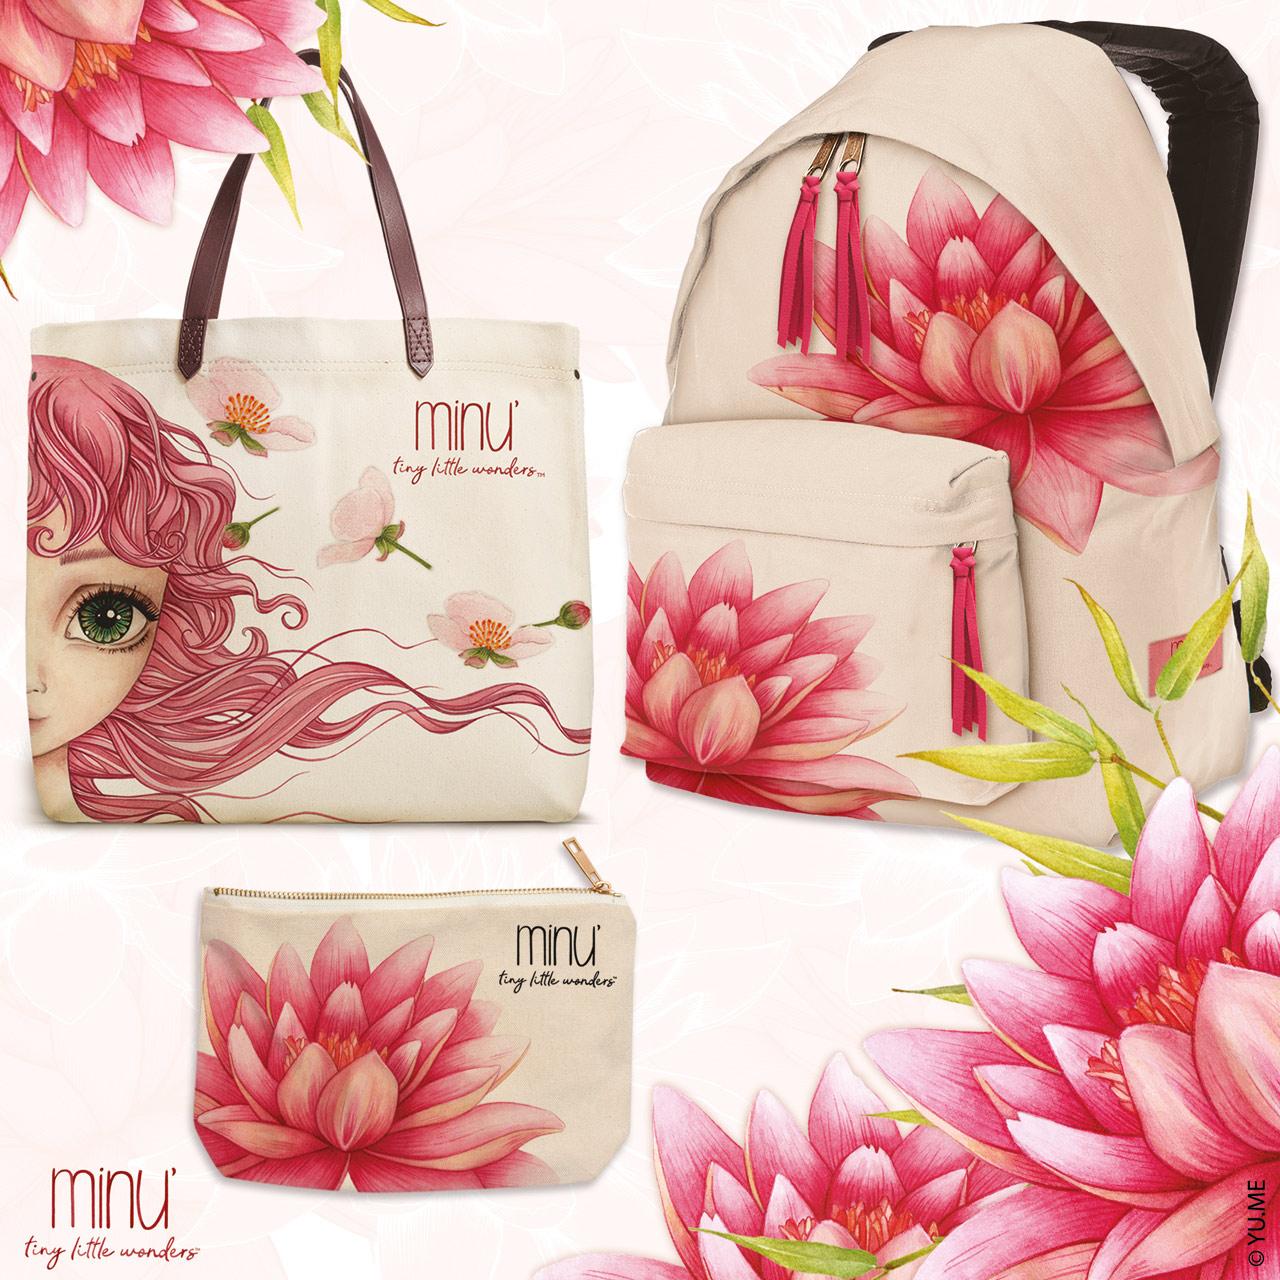 yume nature bags and backpacks